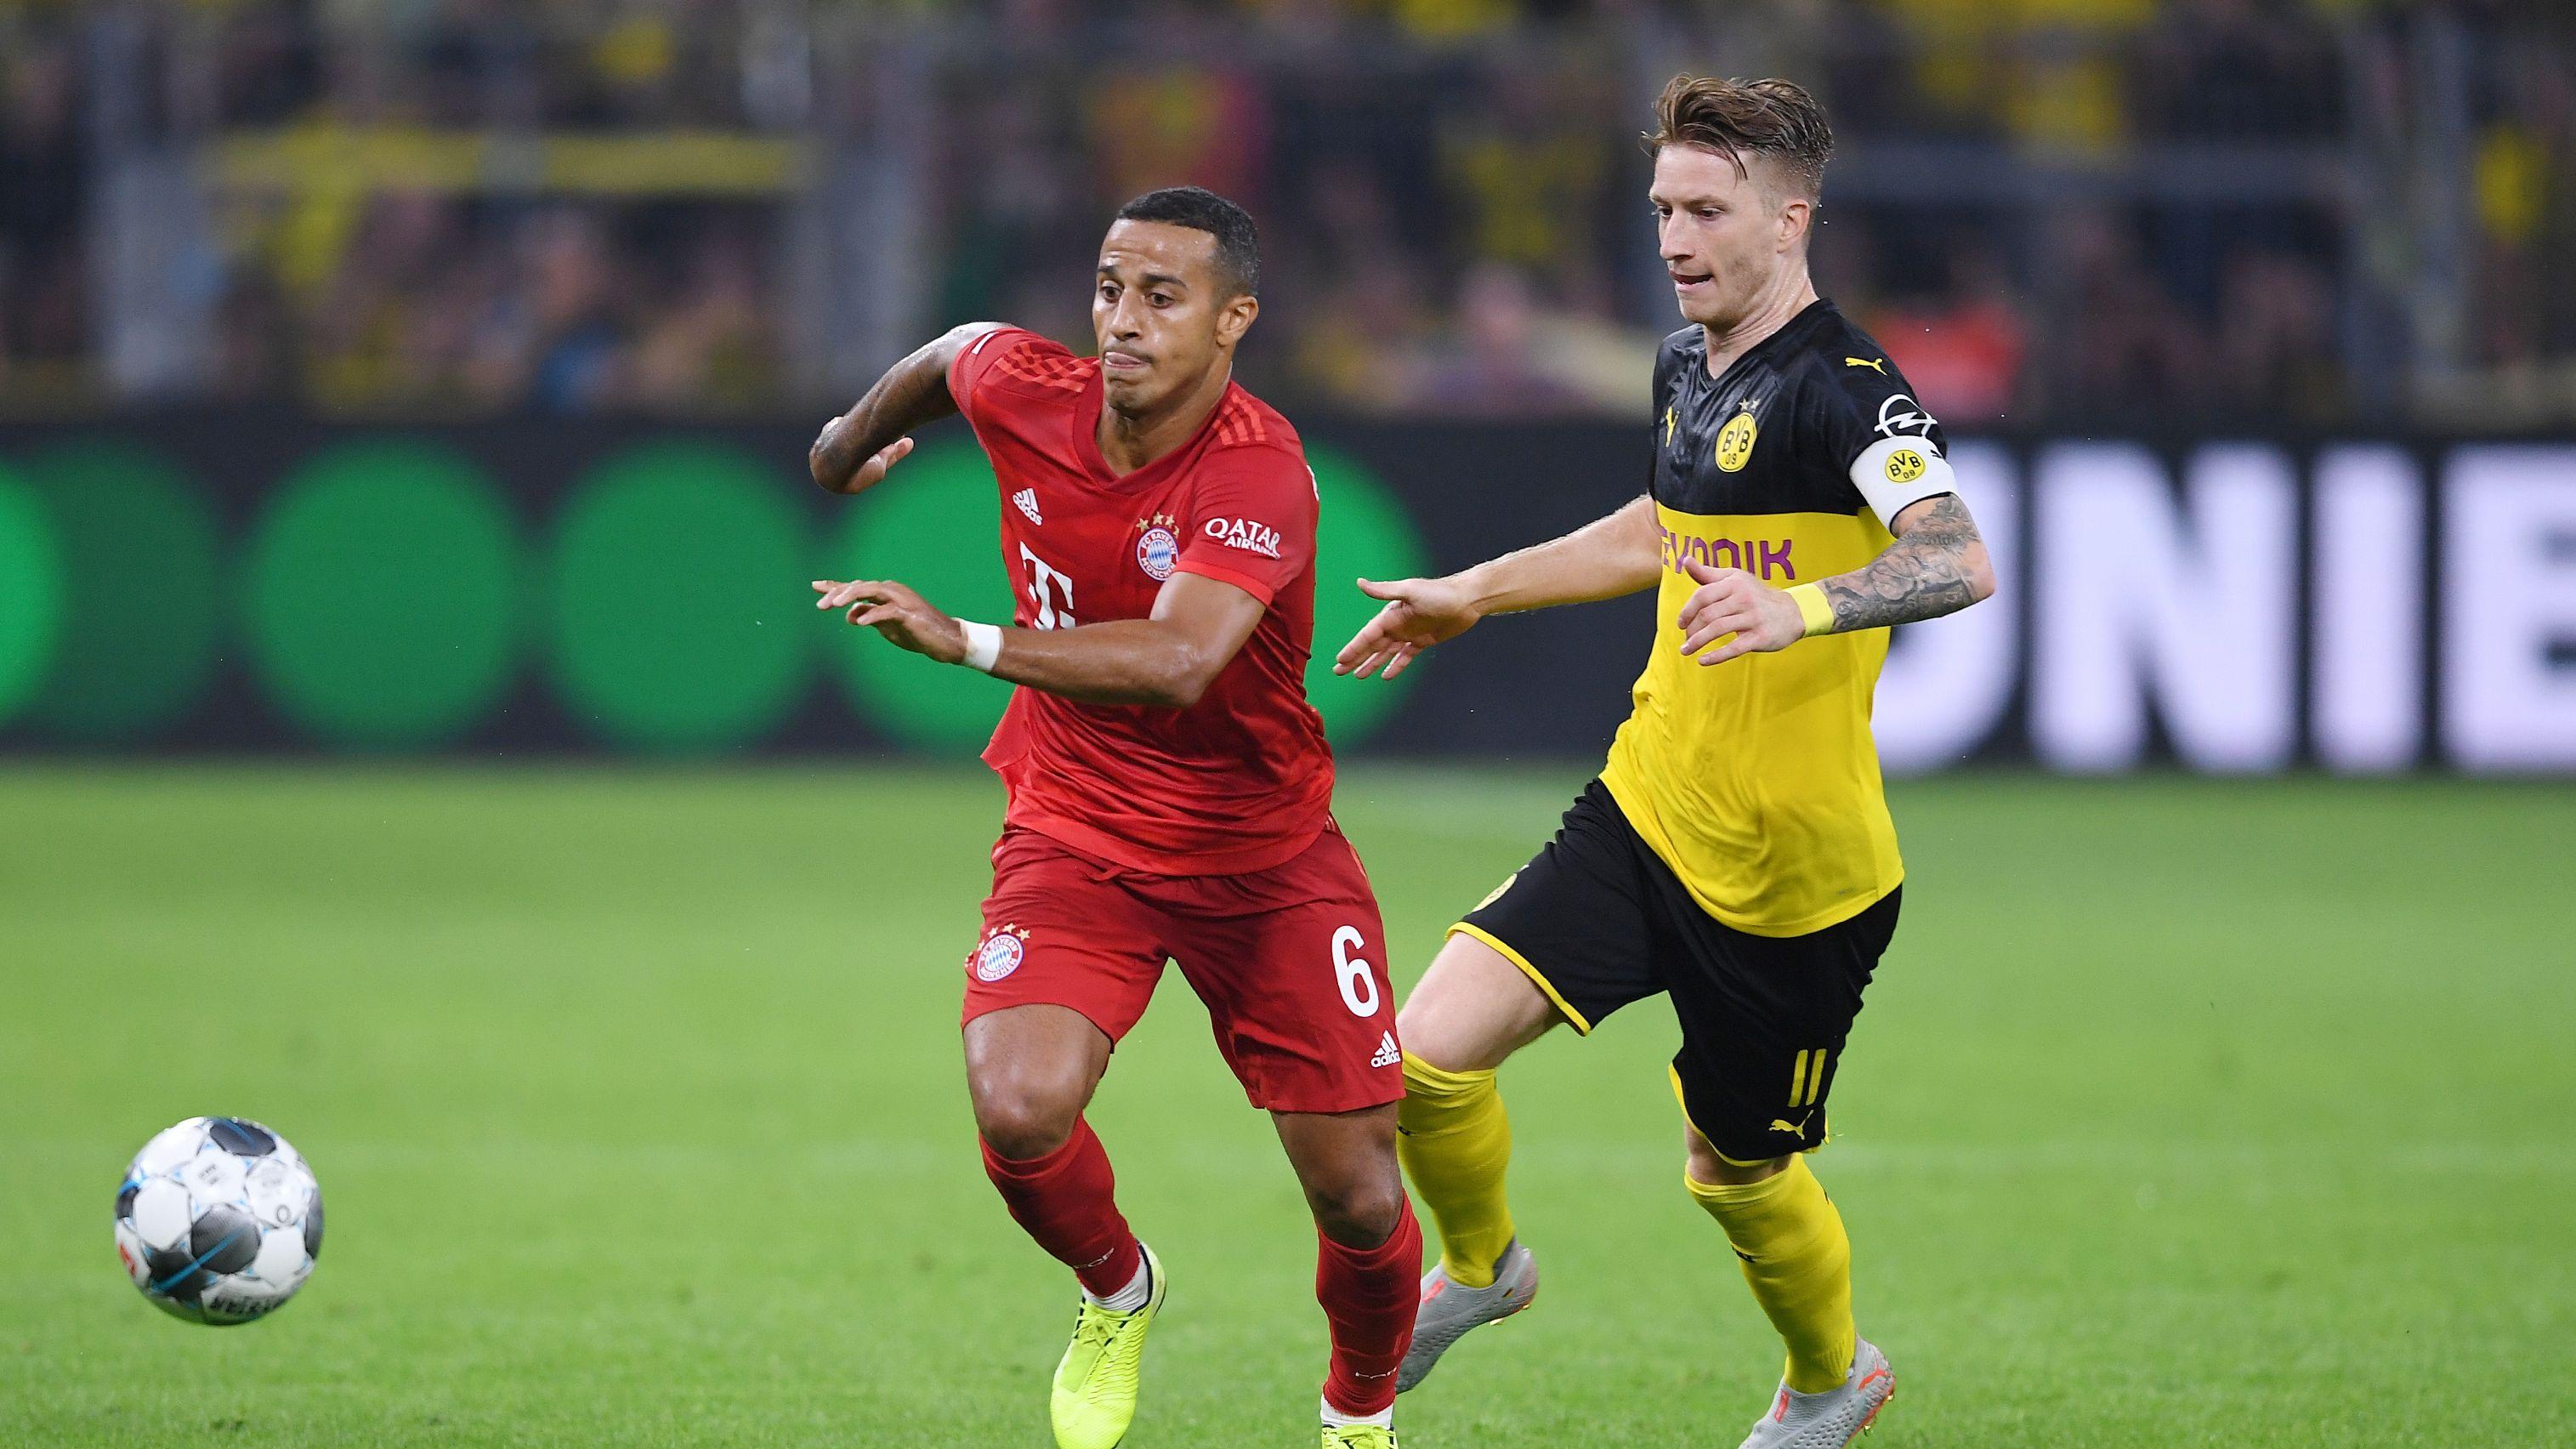 Spielszene Dortmund - Bayern